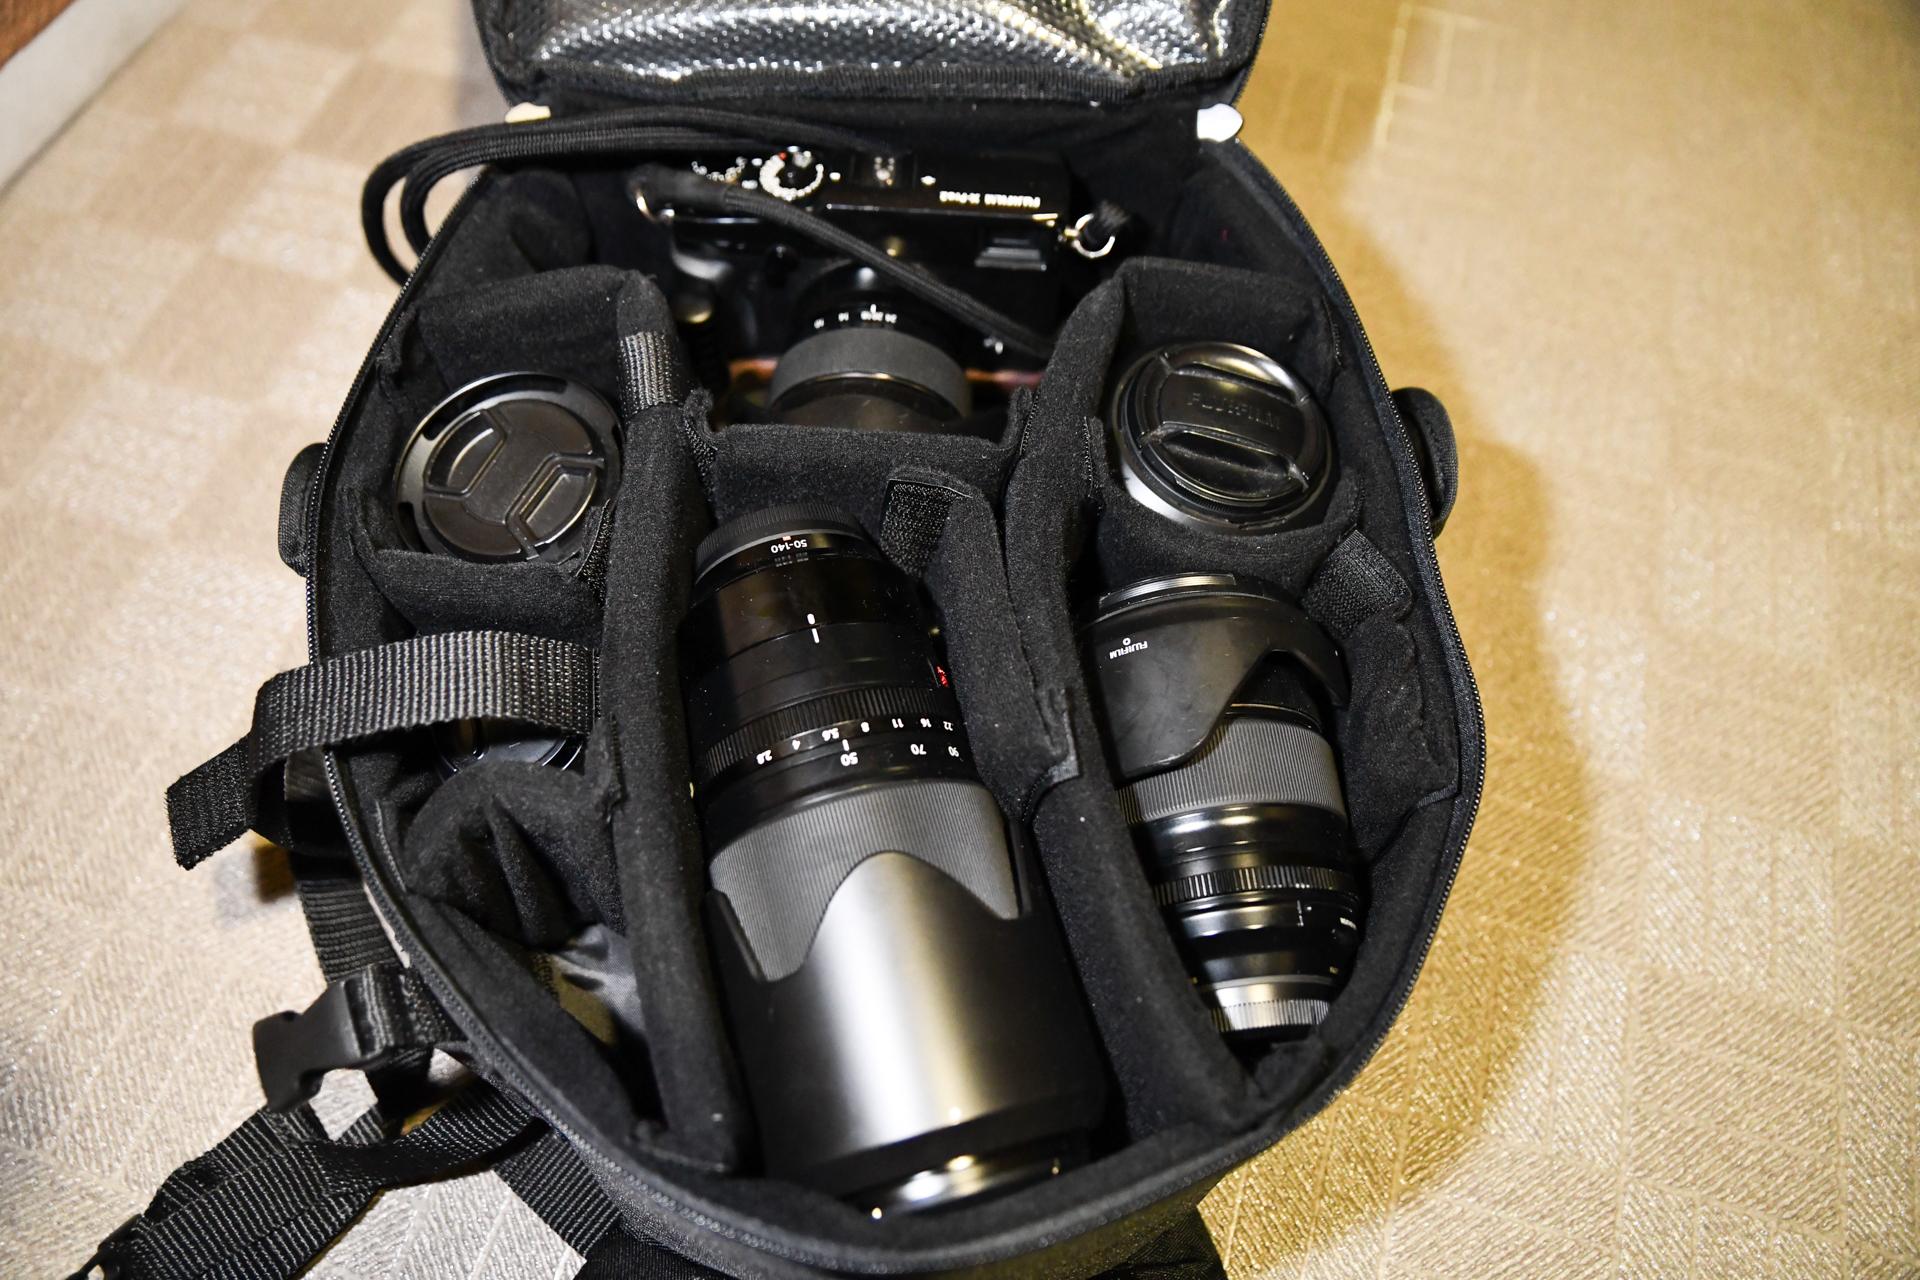 Amazonベーシックカメラバッグレビュー